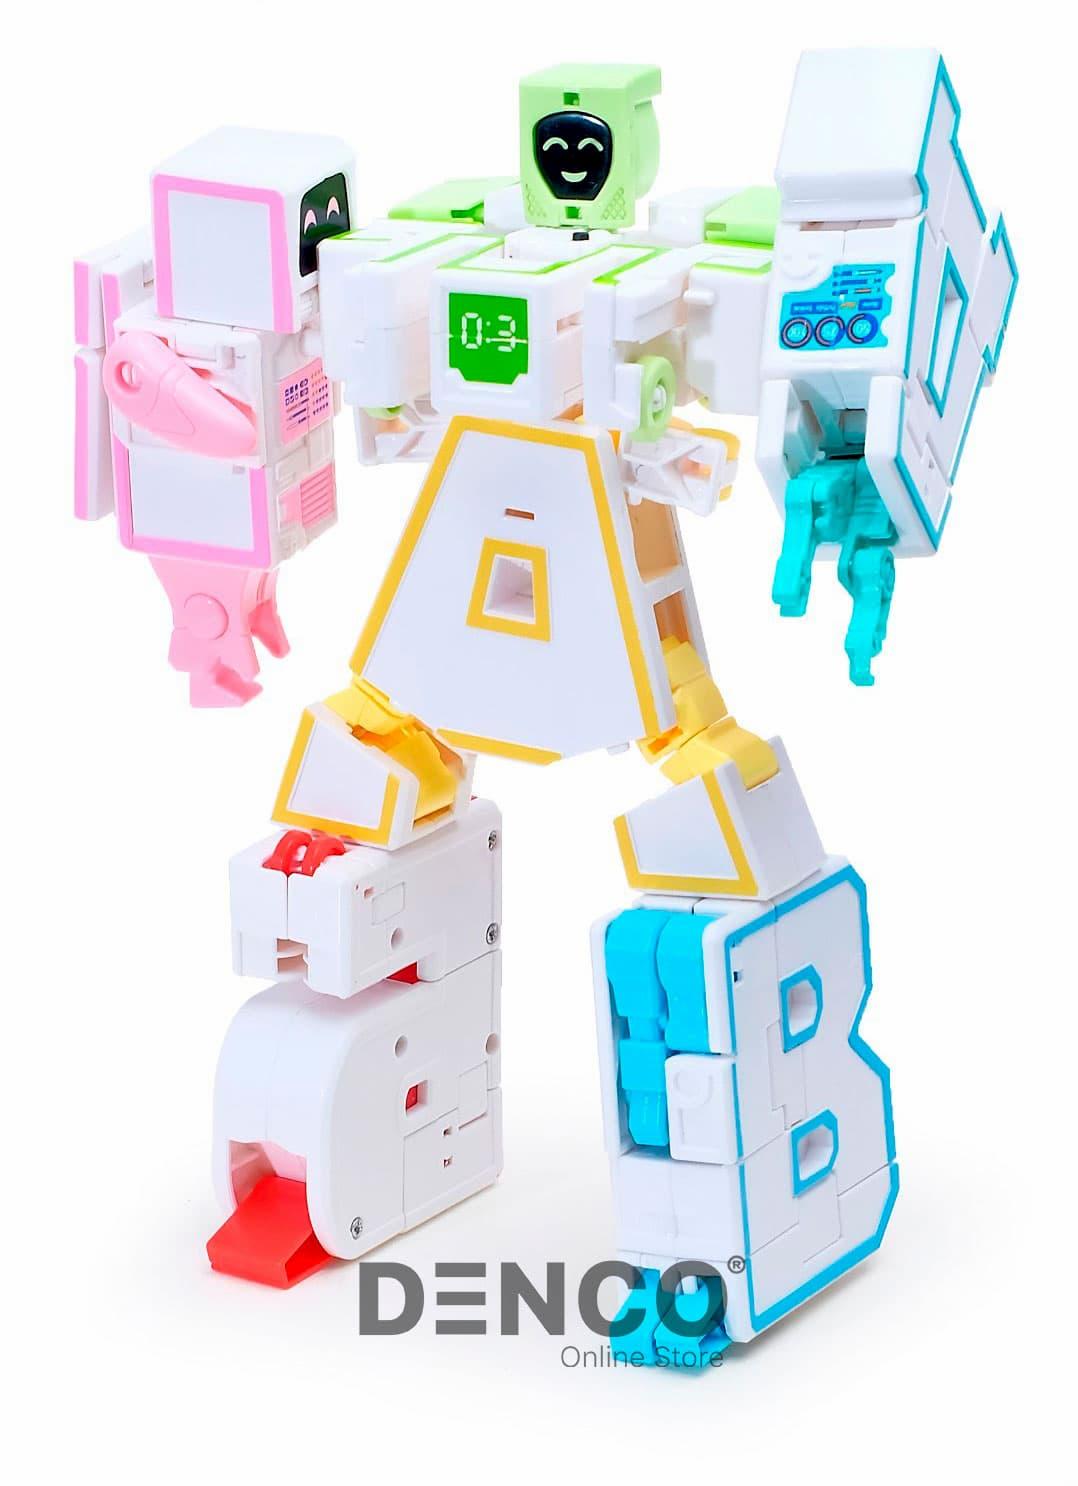 Буква-Трансформер Алфавит Е «Робот-Косметолог» Домашний Защитник